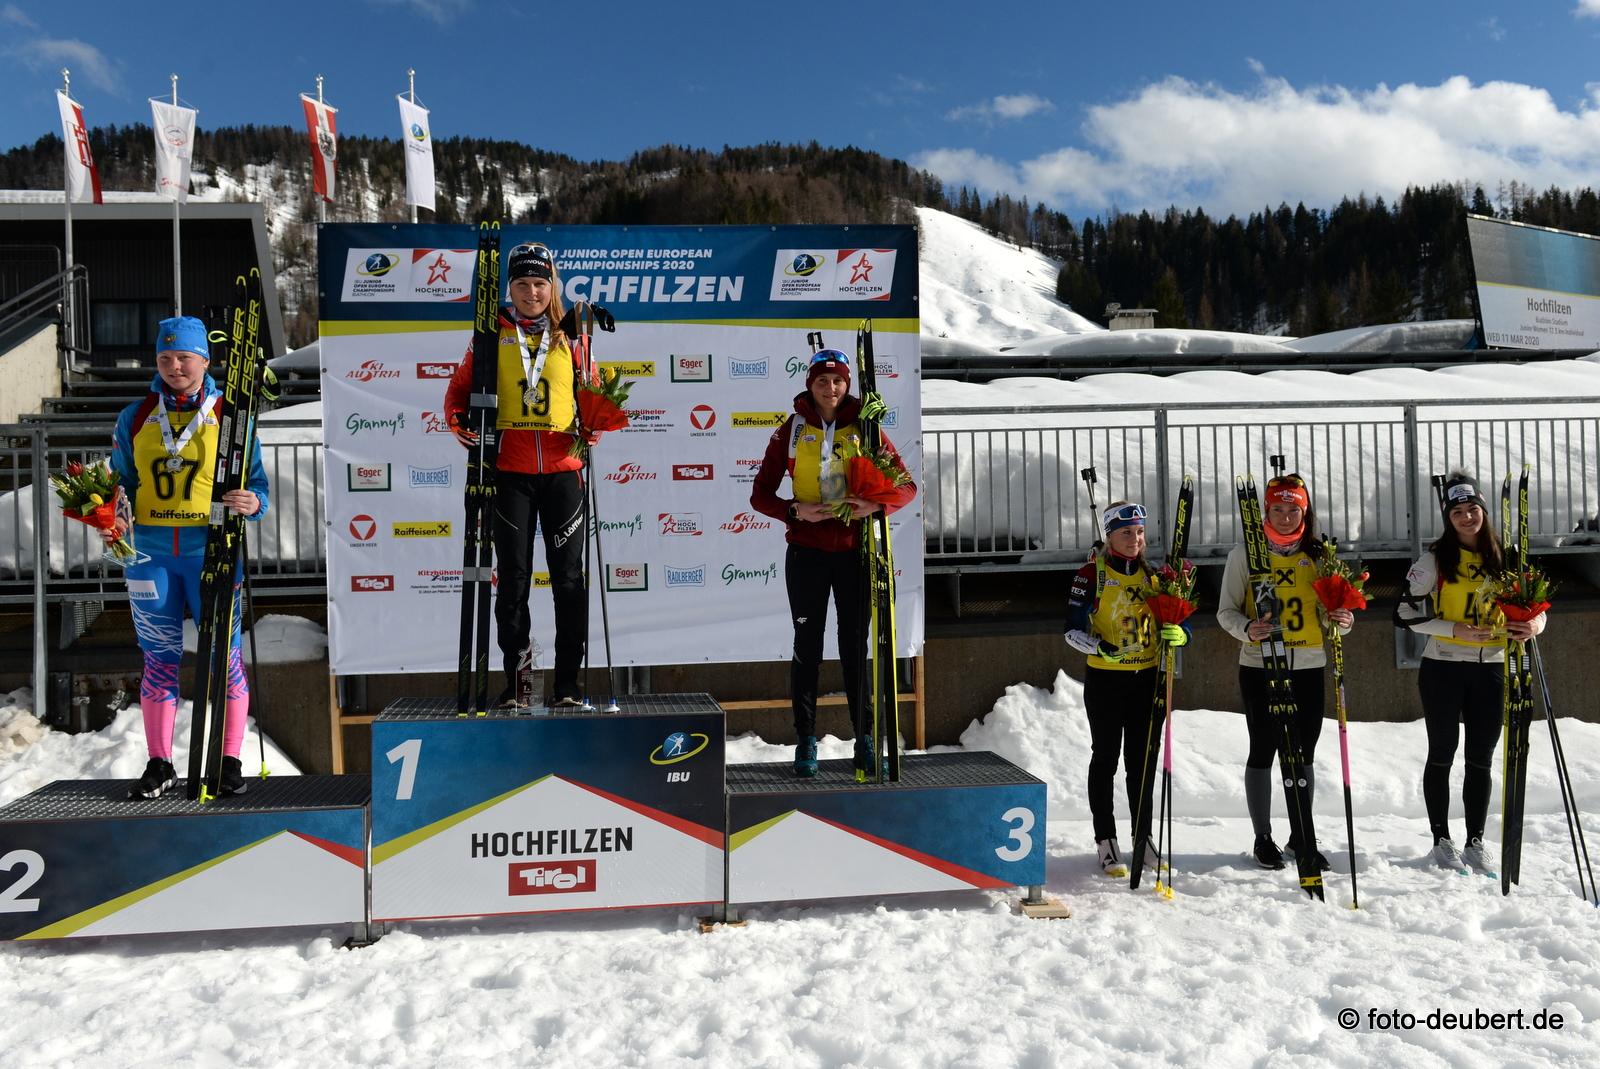 Amina Ivanova (RUS), Anna Gandler (AUT), Joanna Jakiela (POL), Tereza Vobornikova (CZE), Juliane Frühwirt (GER), Maria Zdarkova (BUL) - Foto: © Harald Deubert